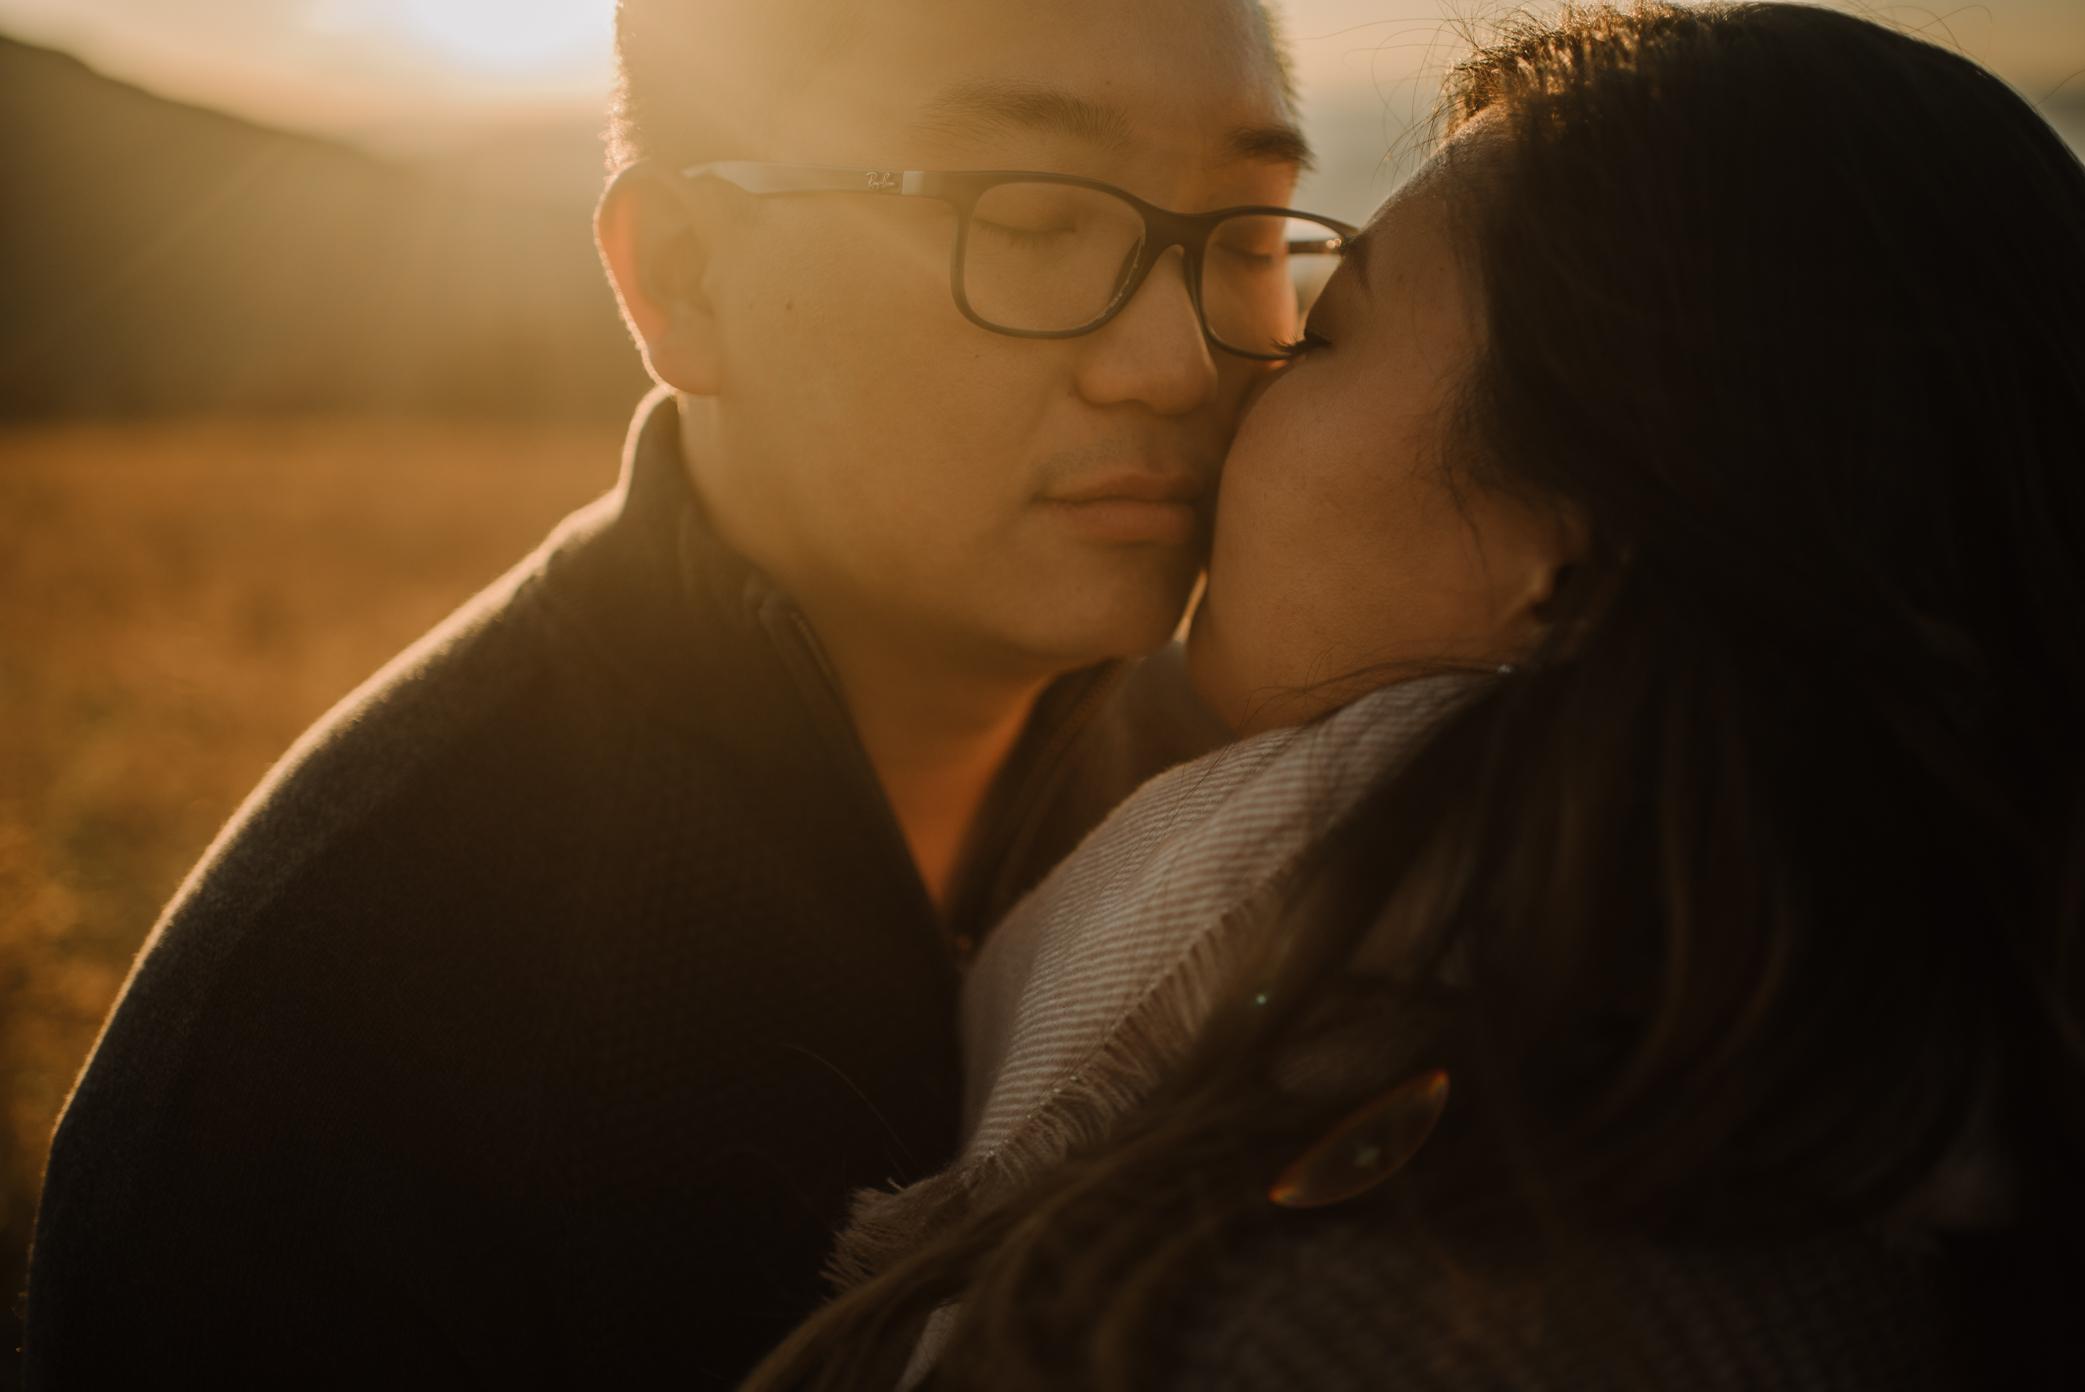 Joshua and Kristina - Shenandoah National Park - Skyline Drive - Winter Engagement Session Photographer - White Sails Creative_31.JPG